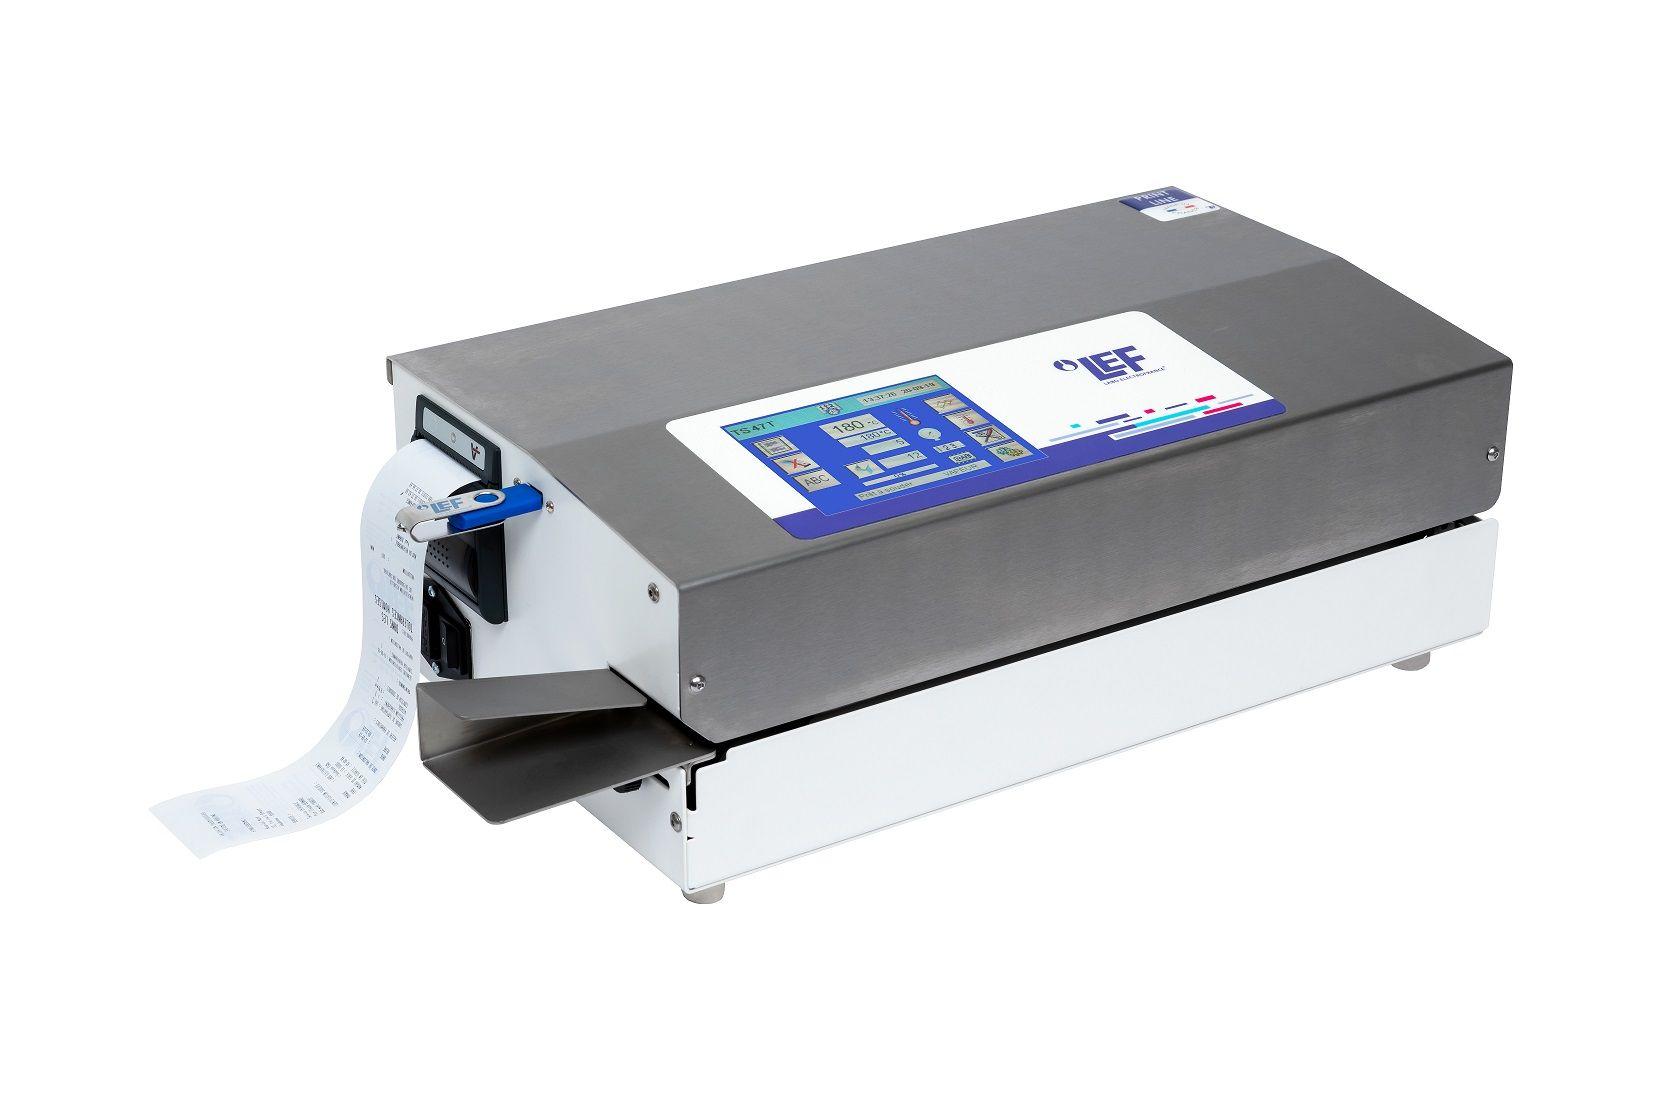 Thermosoudeuse print line - ts 47 / ts 47n / ts 47t